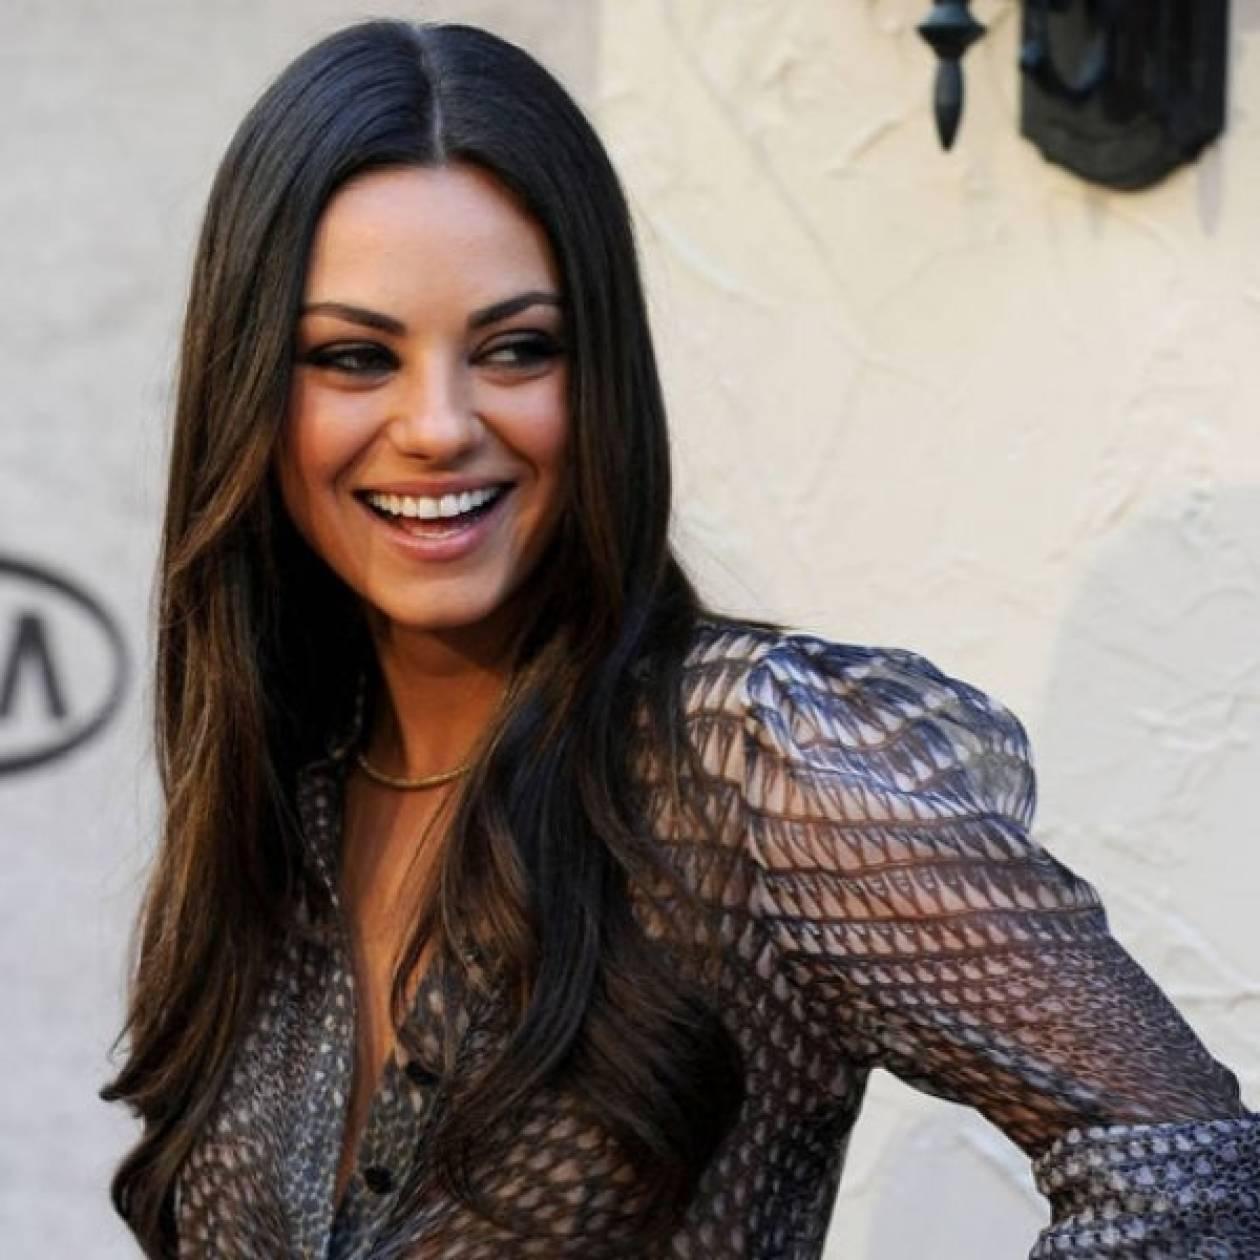 Mila Kunis: Δε νιώθει σέξι αλλά έχει ένα μυστικό που τρελαίνει